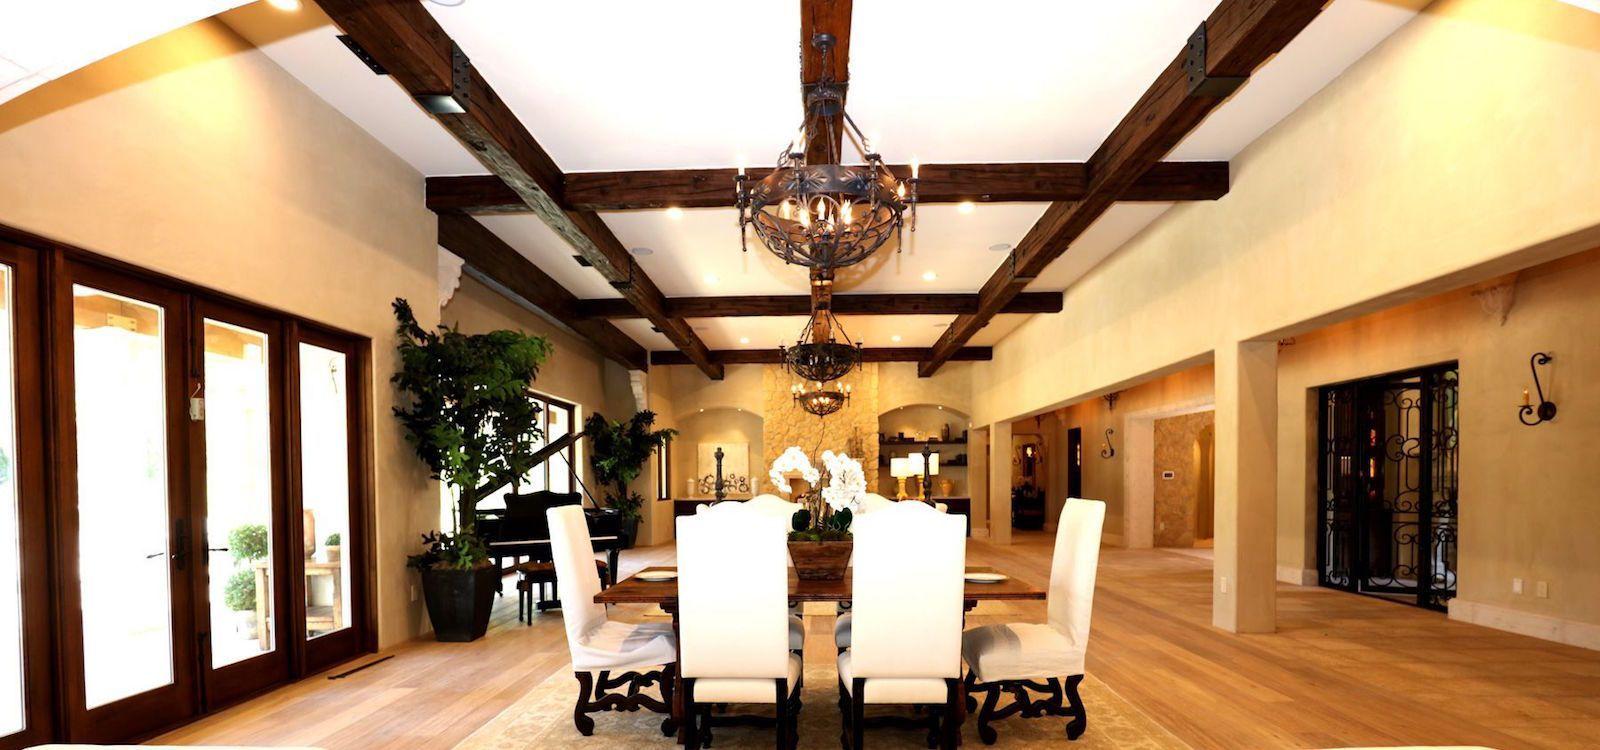 Fariba Namvar - Rancho Santa Fe Luxury Homes